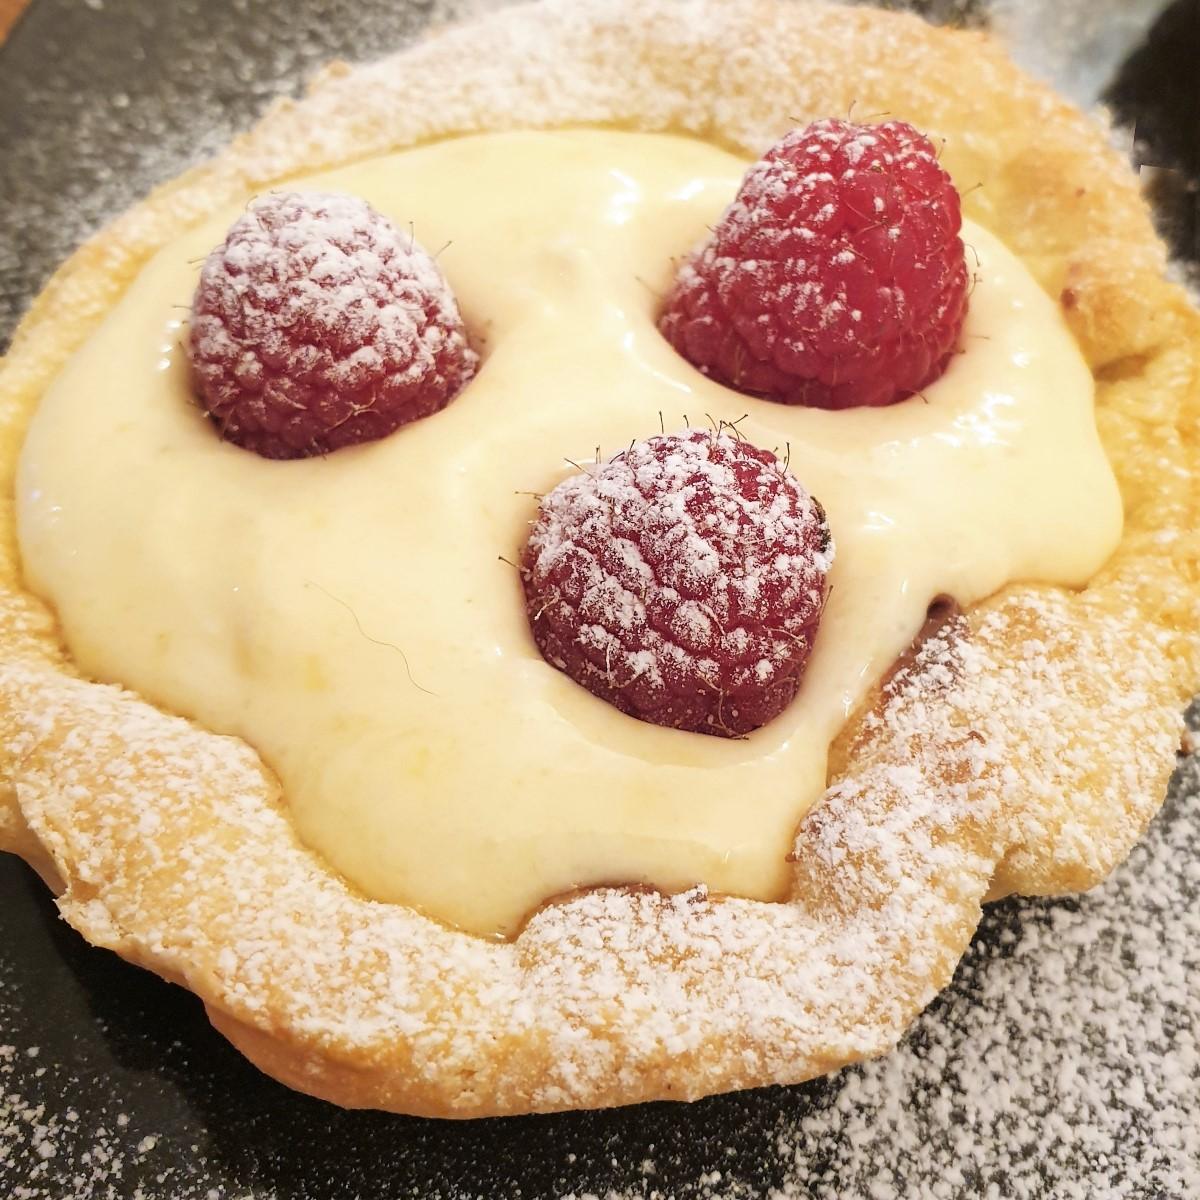 A raspberry custard tart with 3 raspberries, sprinkled with icing sugar.